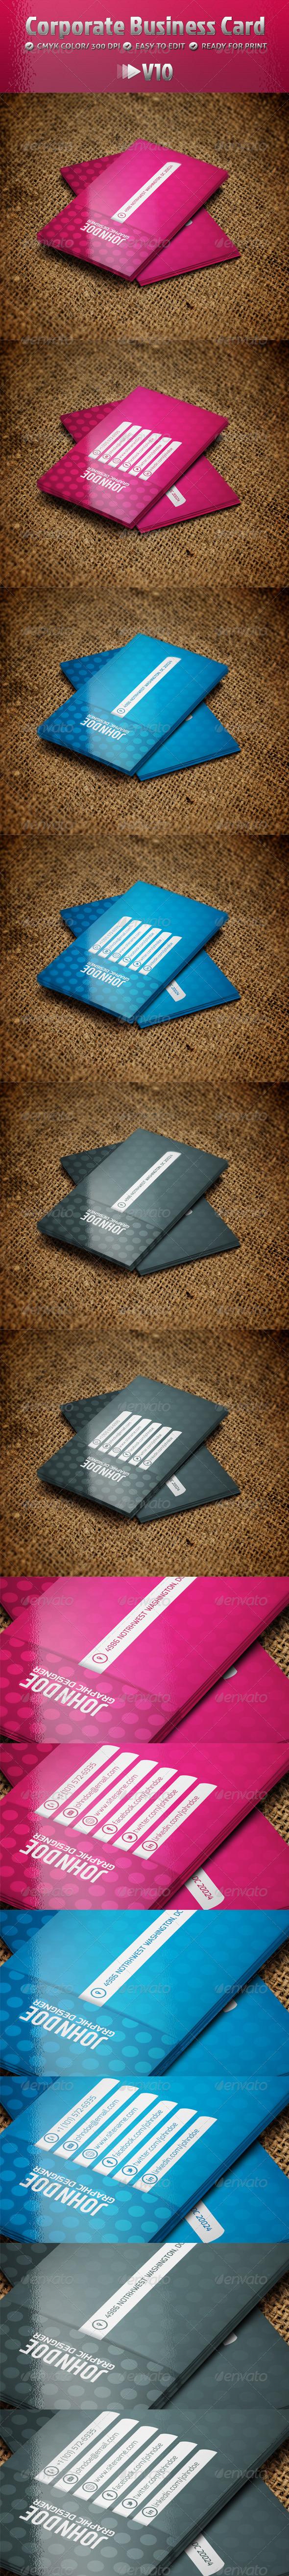 Corporate Business Card V10 - Corporate Business Cards